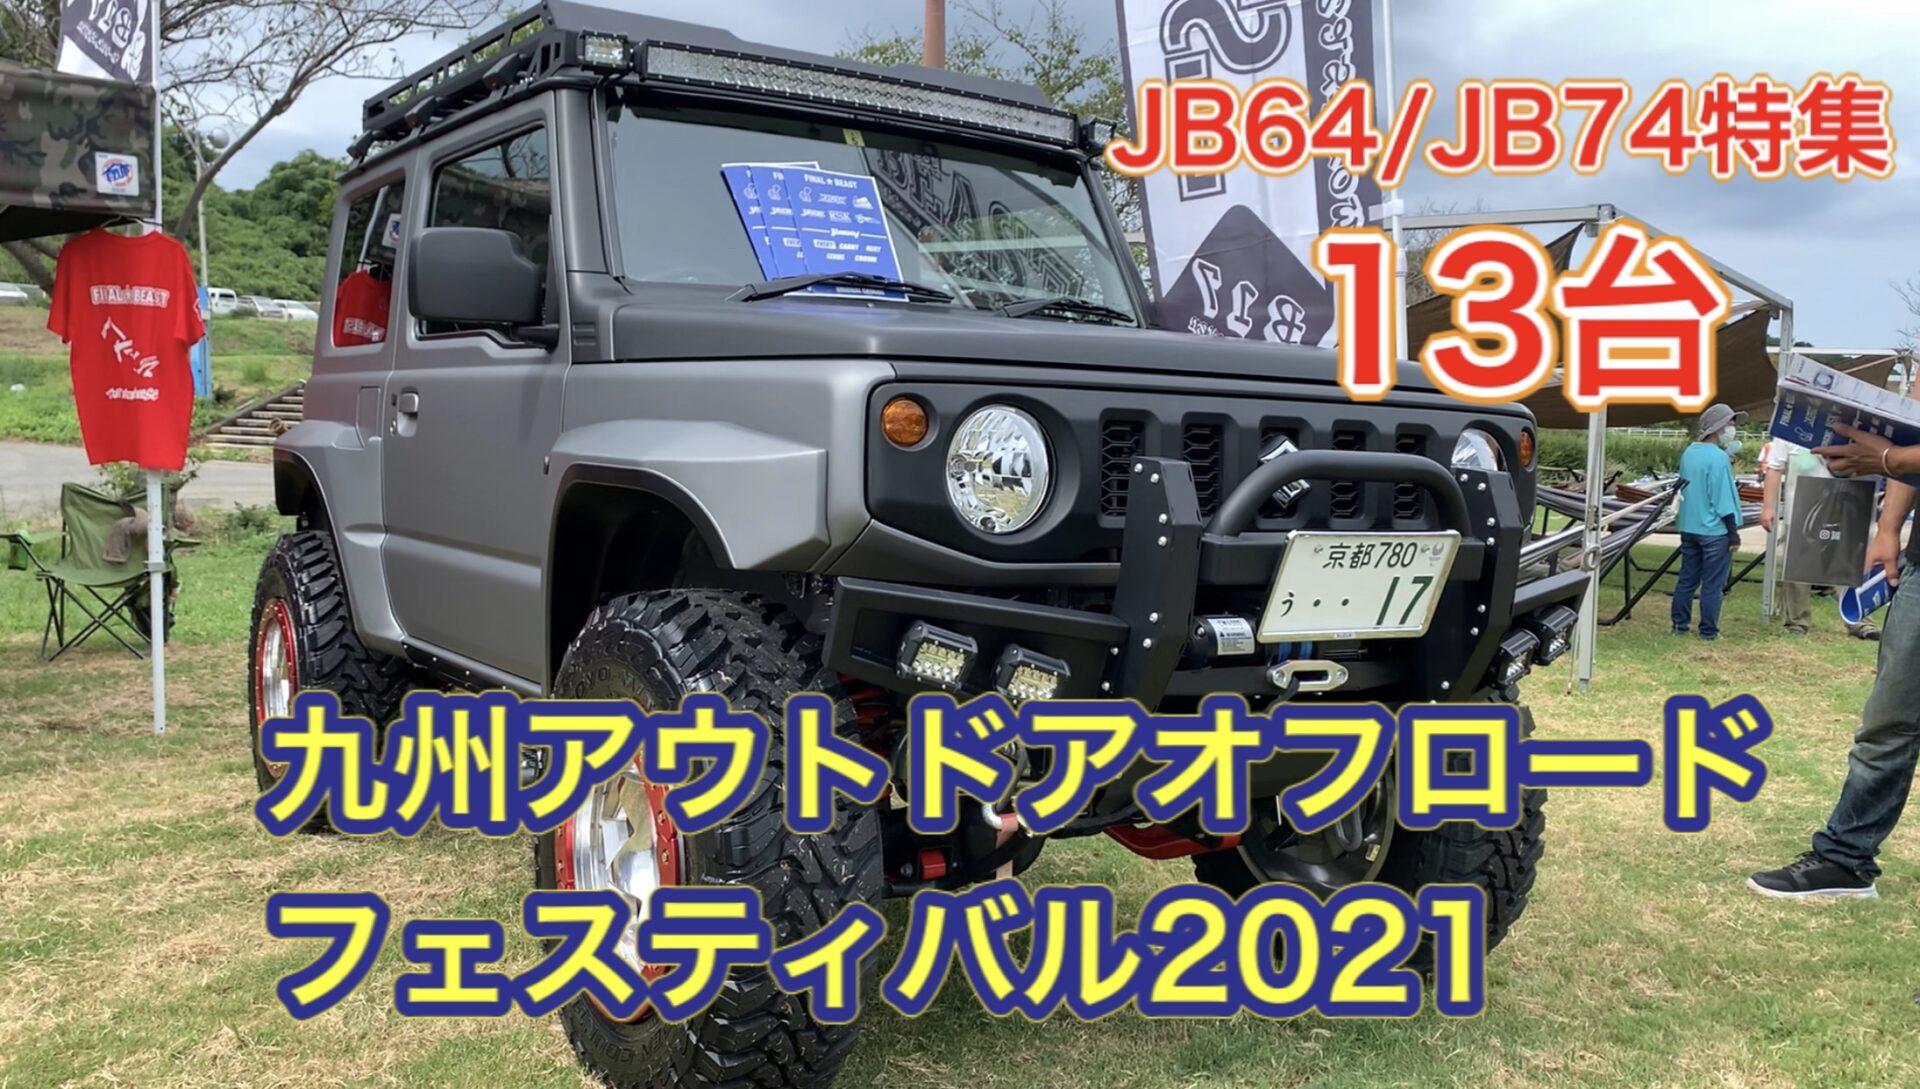 【JB64ジムニー/JB74シエラ特集】九州アウトドアオフロードフェスティバル2021で出展された13台を一挙紹介